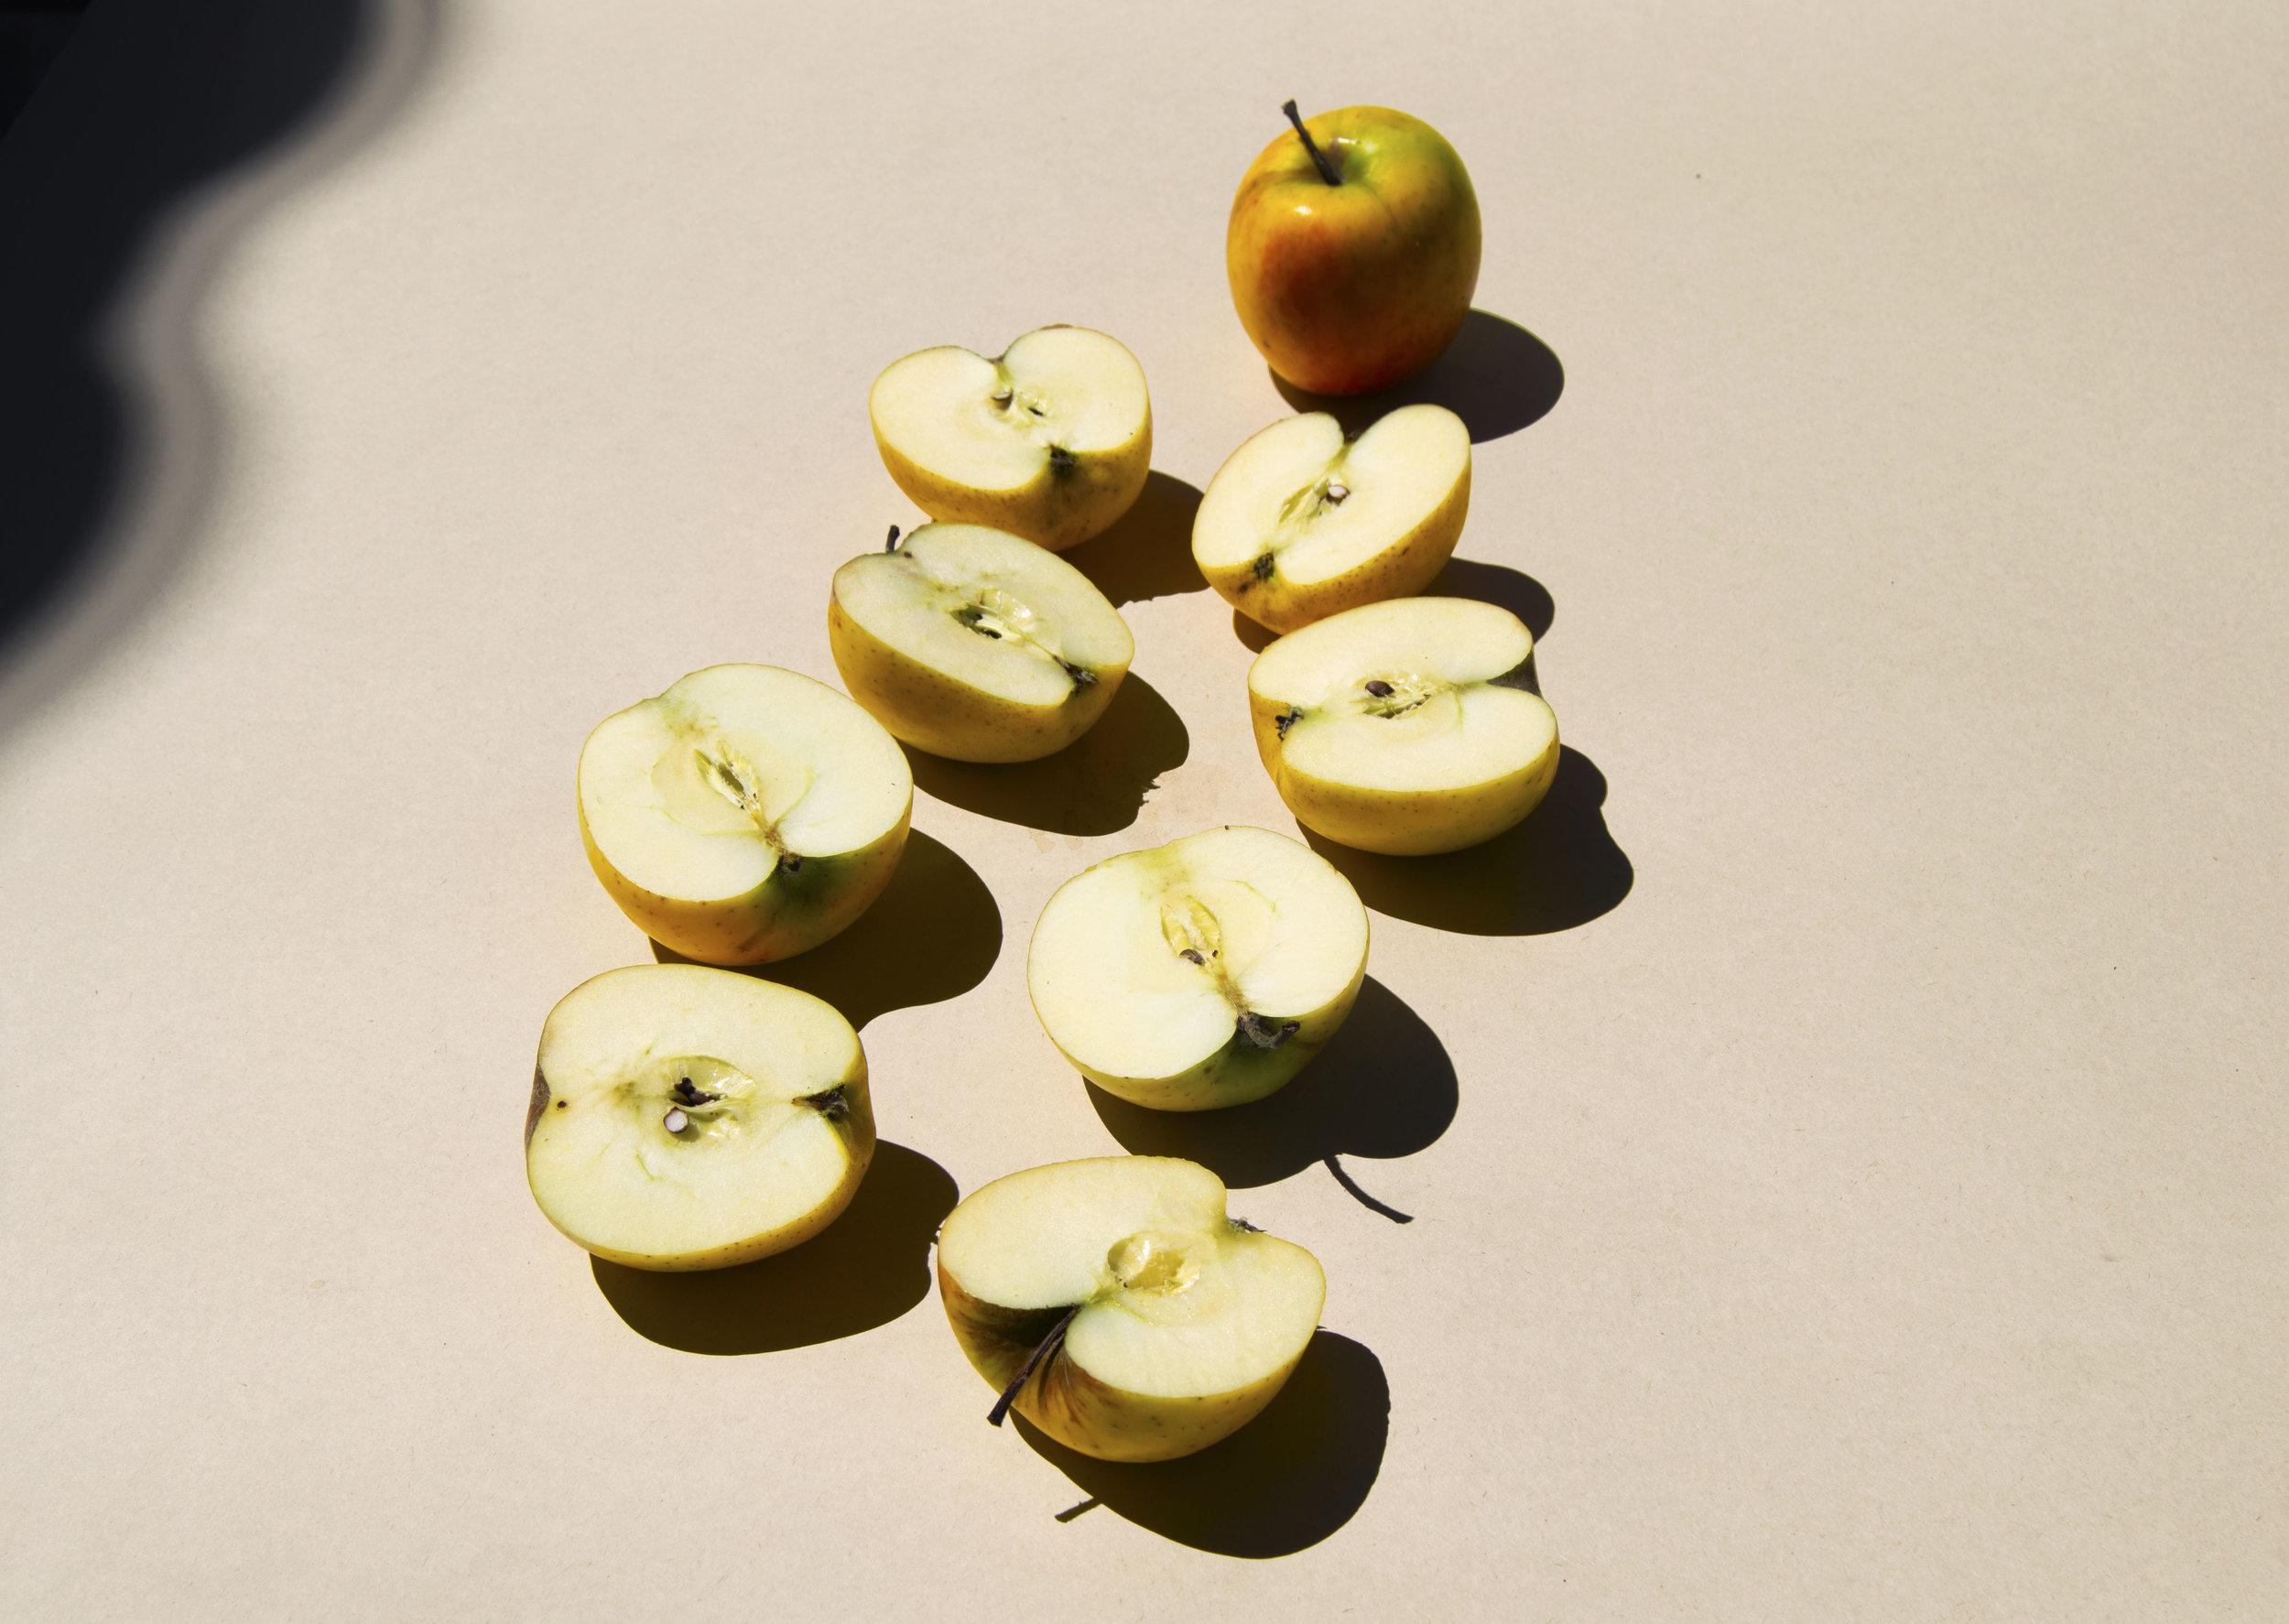 Manzana emilia - Revista Chiú